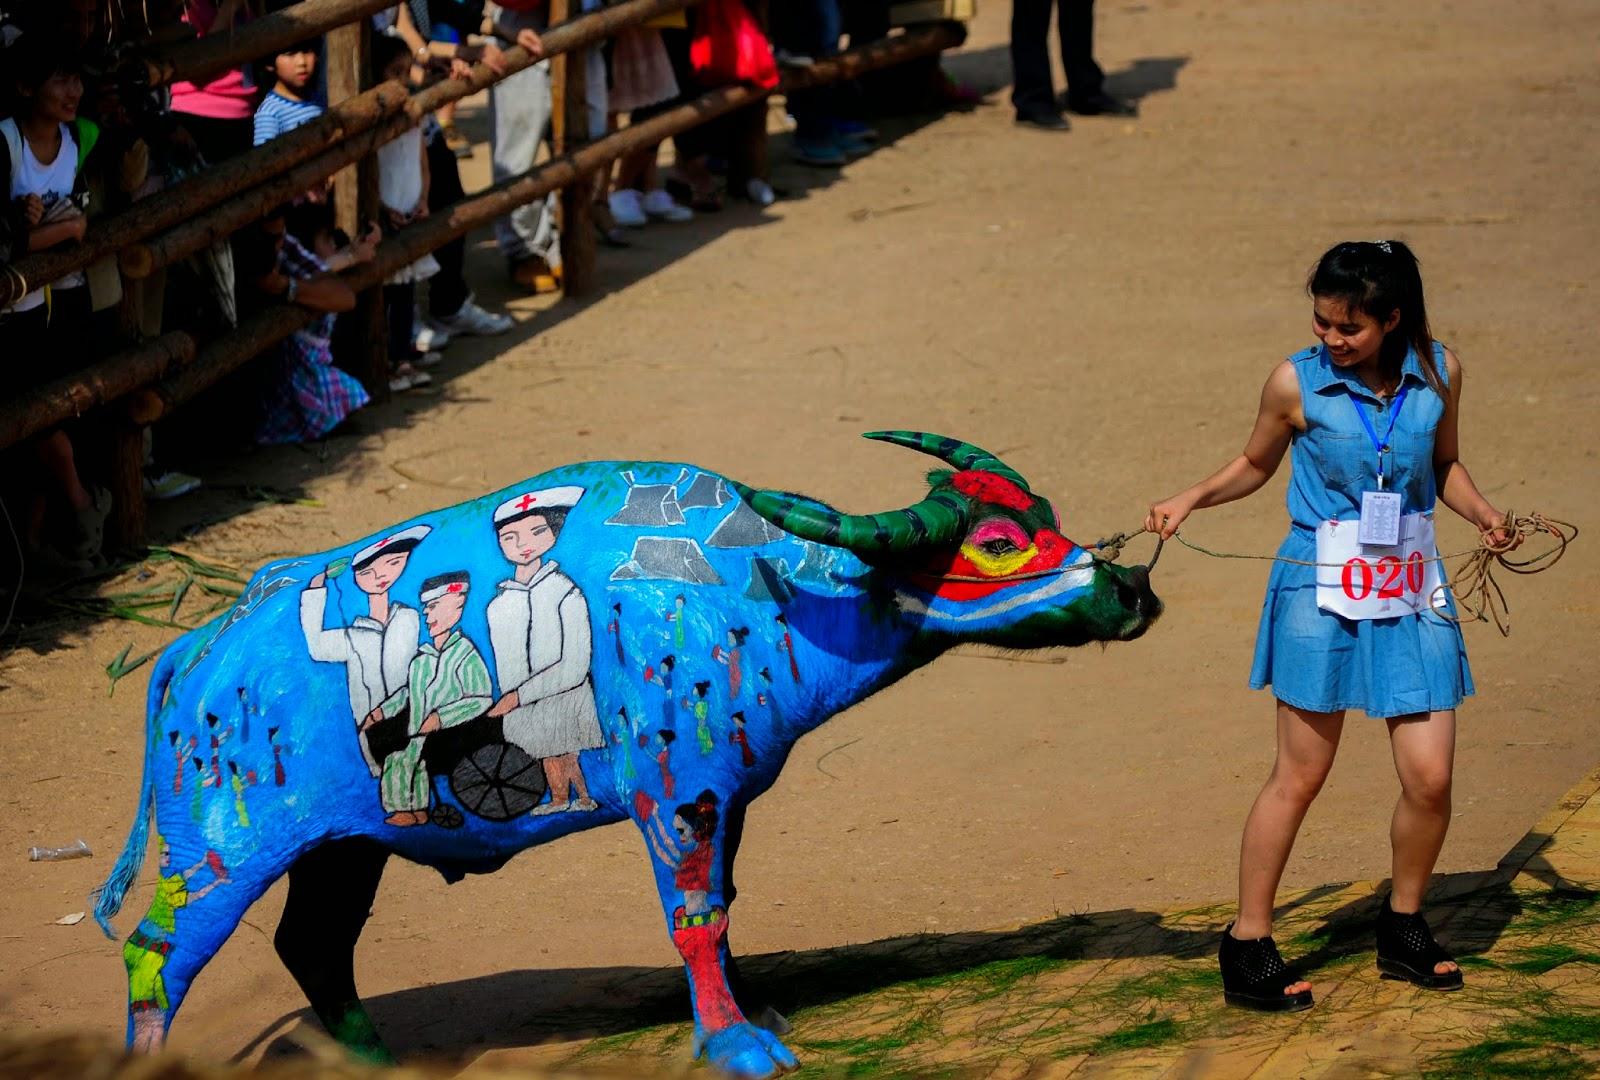 Buffalo, Bodypainting Competition, Buffalo Bodypainting, Offbeat, Animals, Animals Competitions, News, Jiangcheng, Yunnan, Artists, Painted Buffalos,